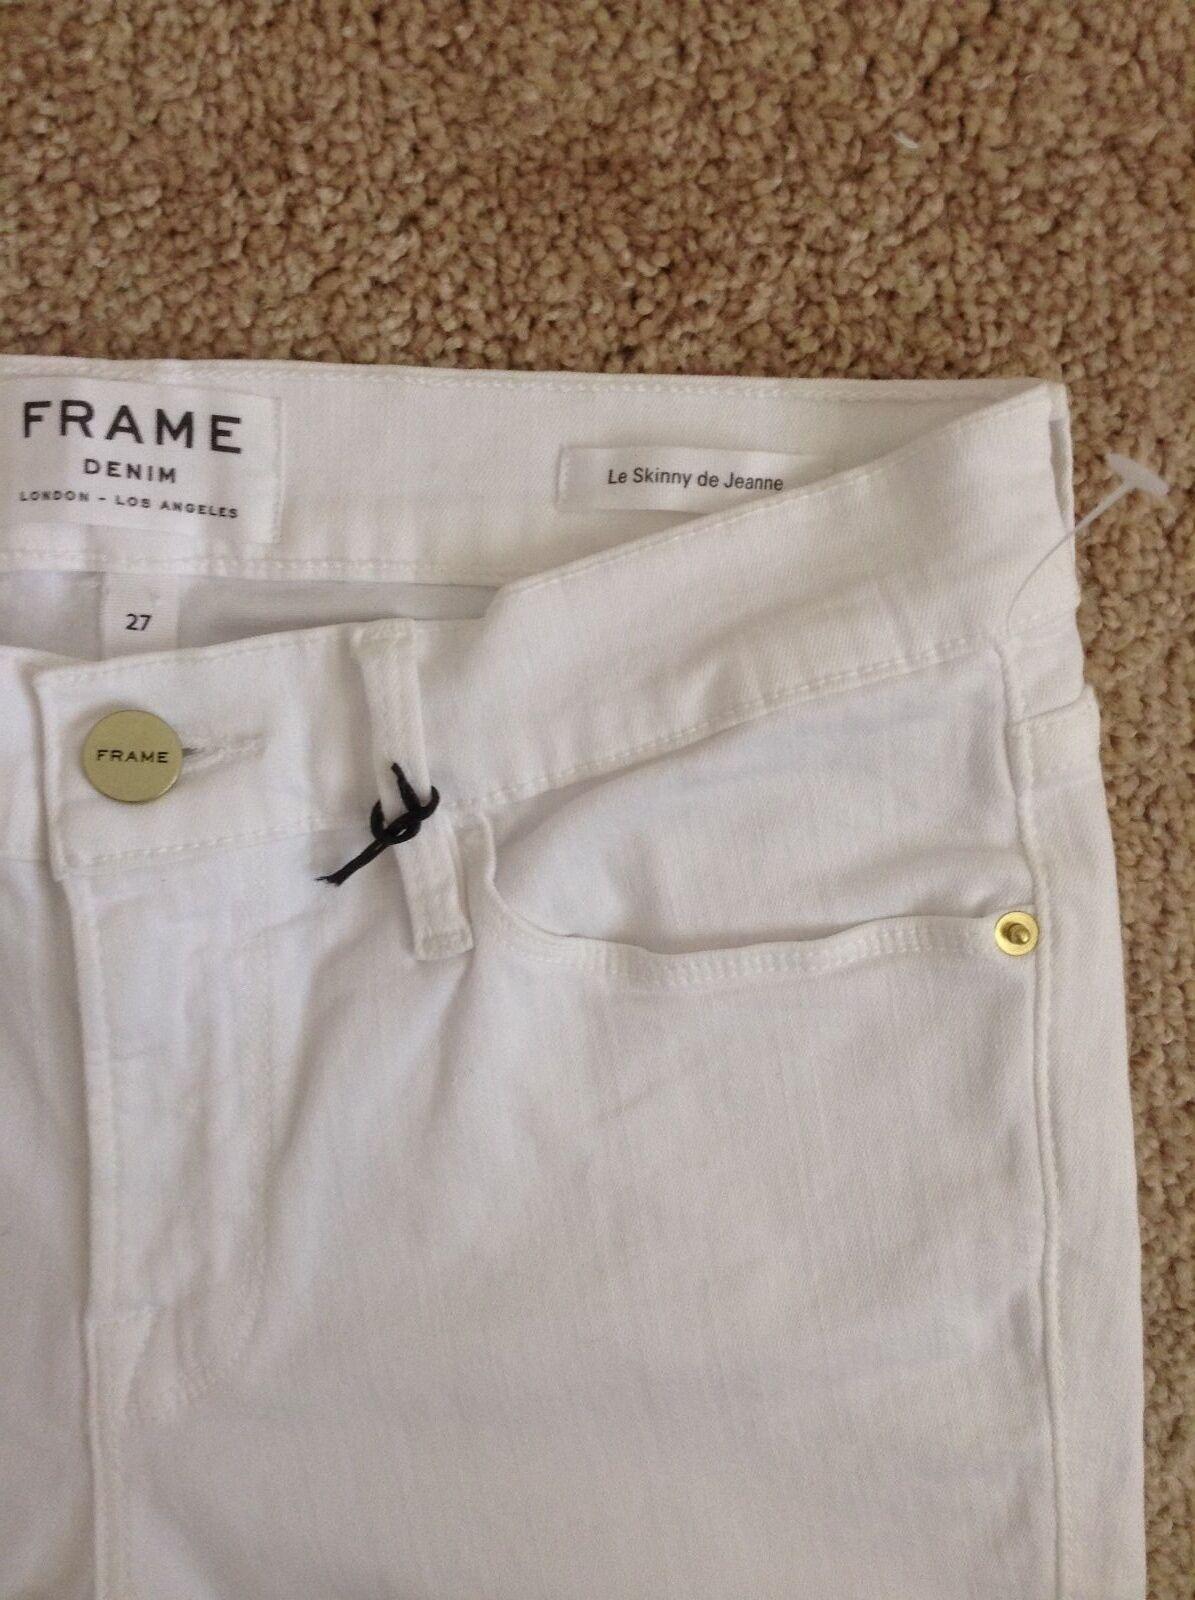 NEW FRAME DENIM  Le color Le Skinny de Jeannewhite (White)27 waist